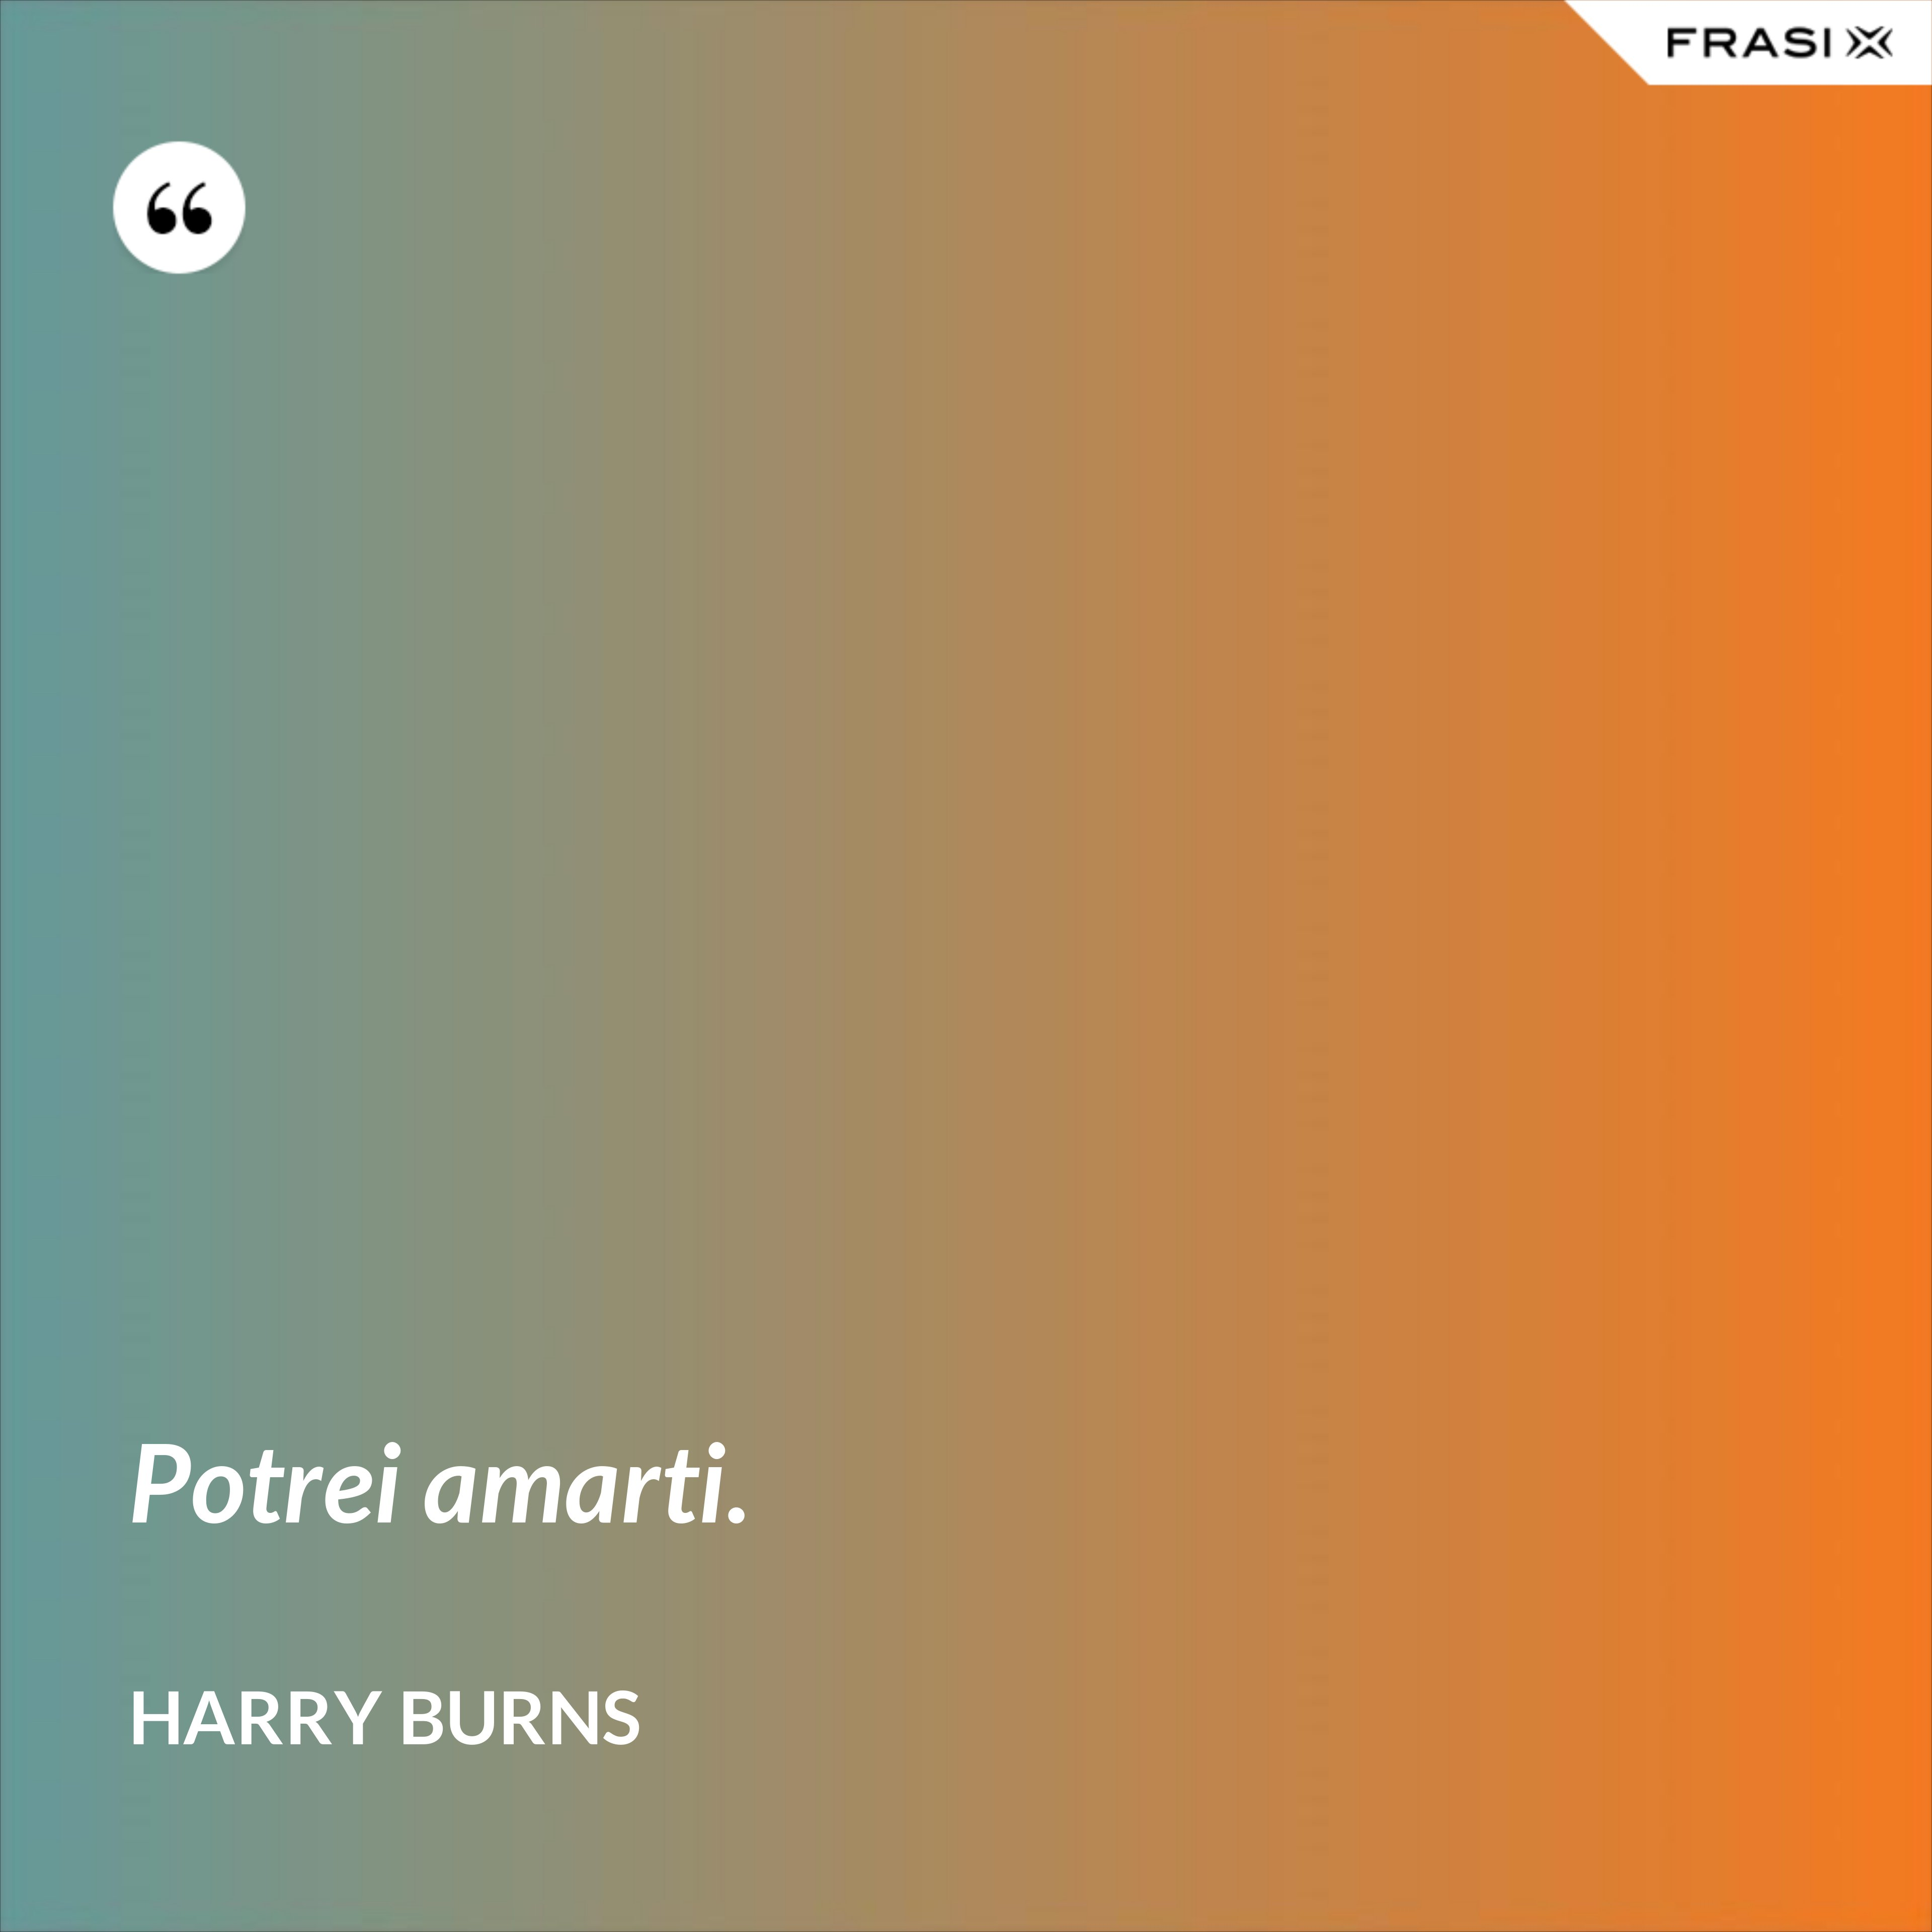 Potrei amarti. - Harry Burns